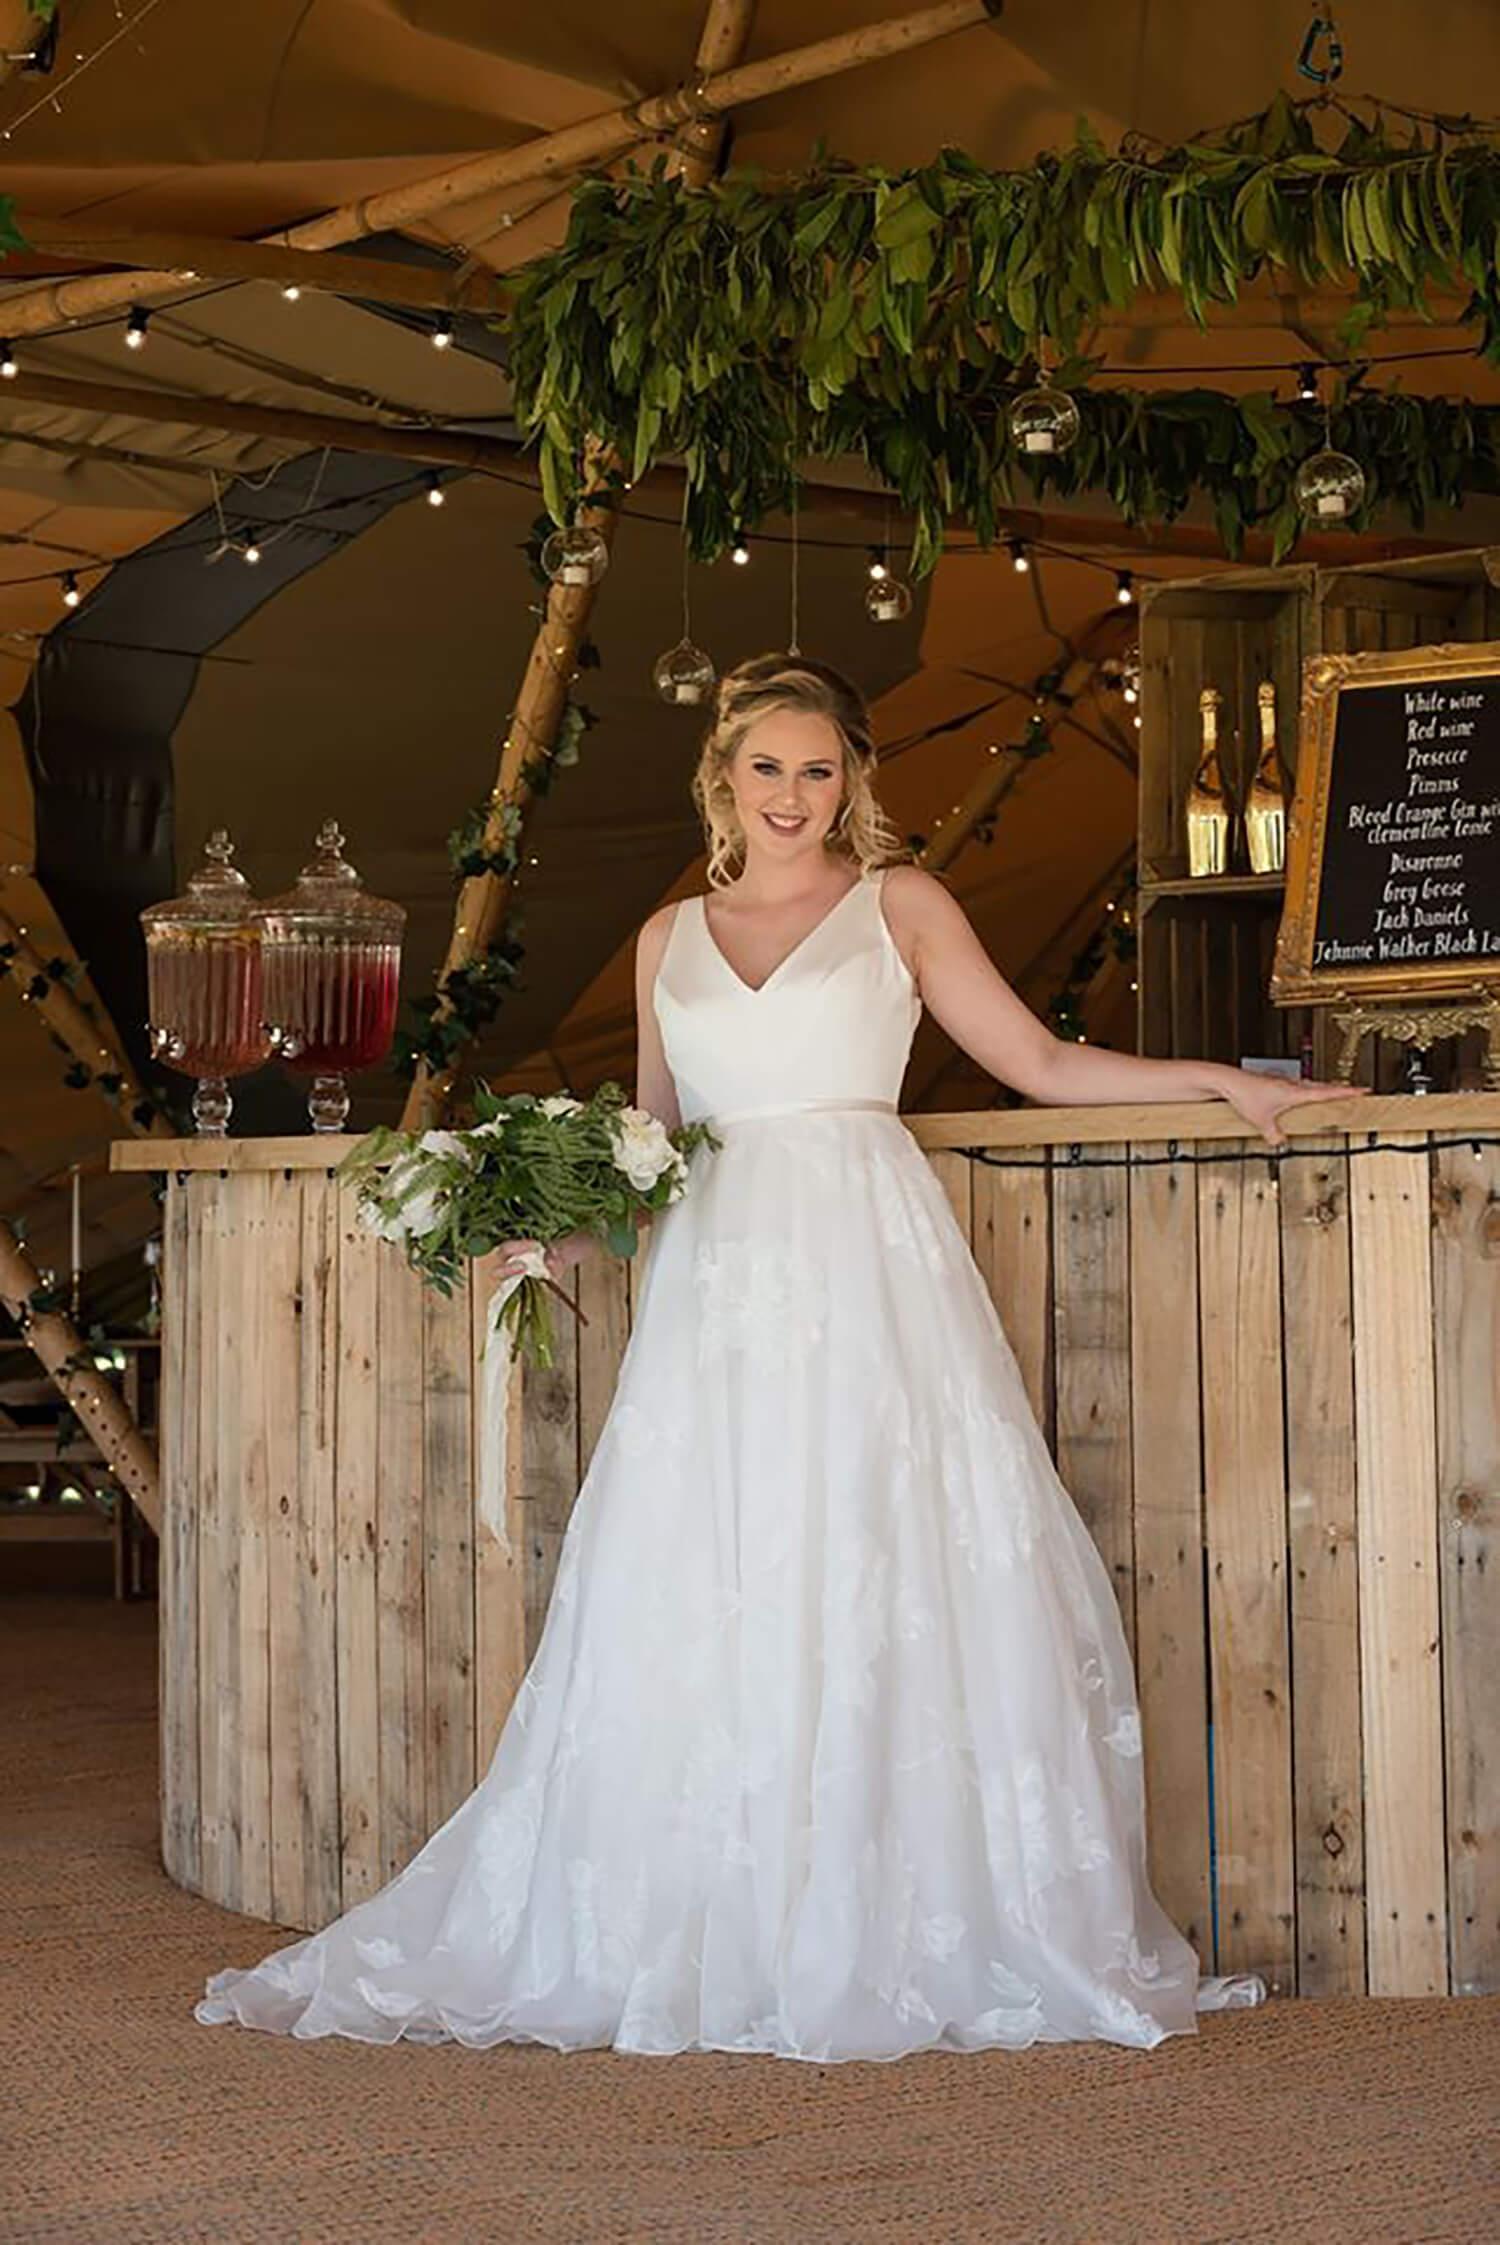 Bride And Round Bar